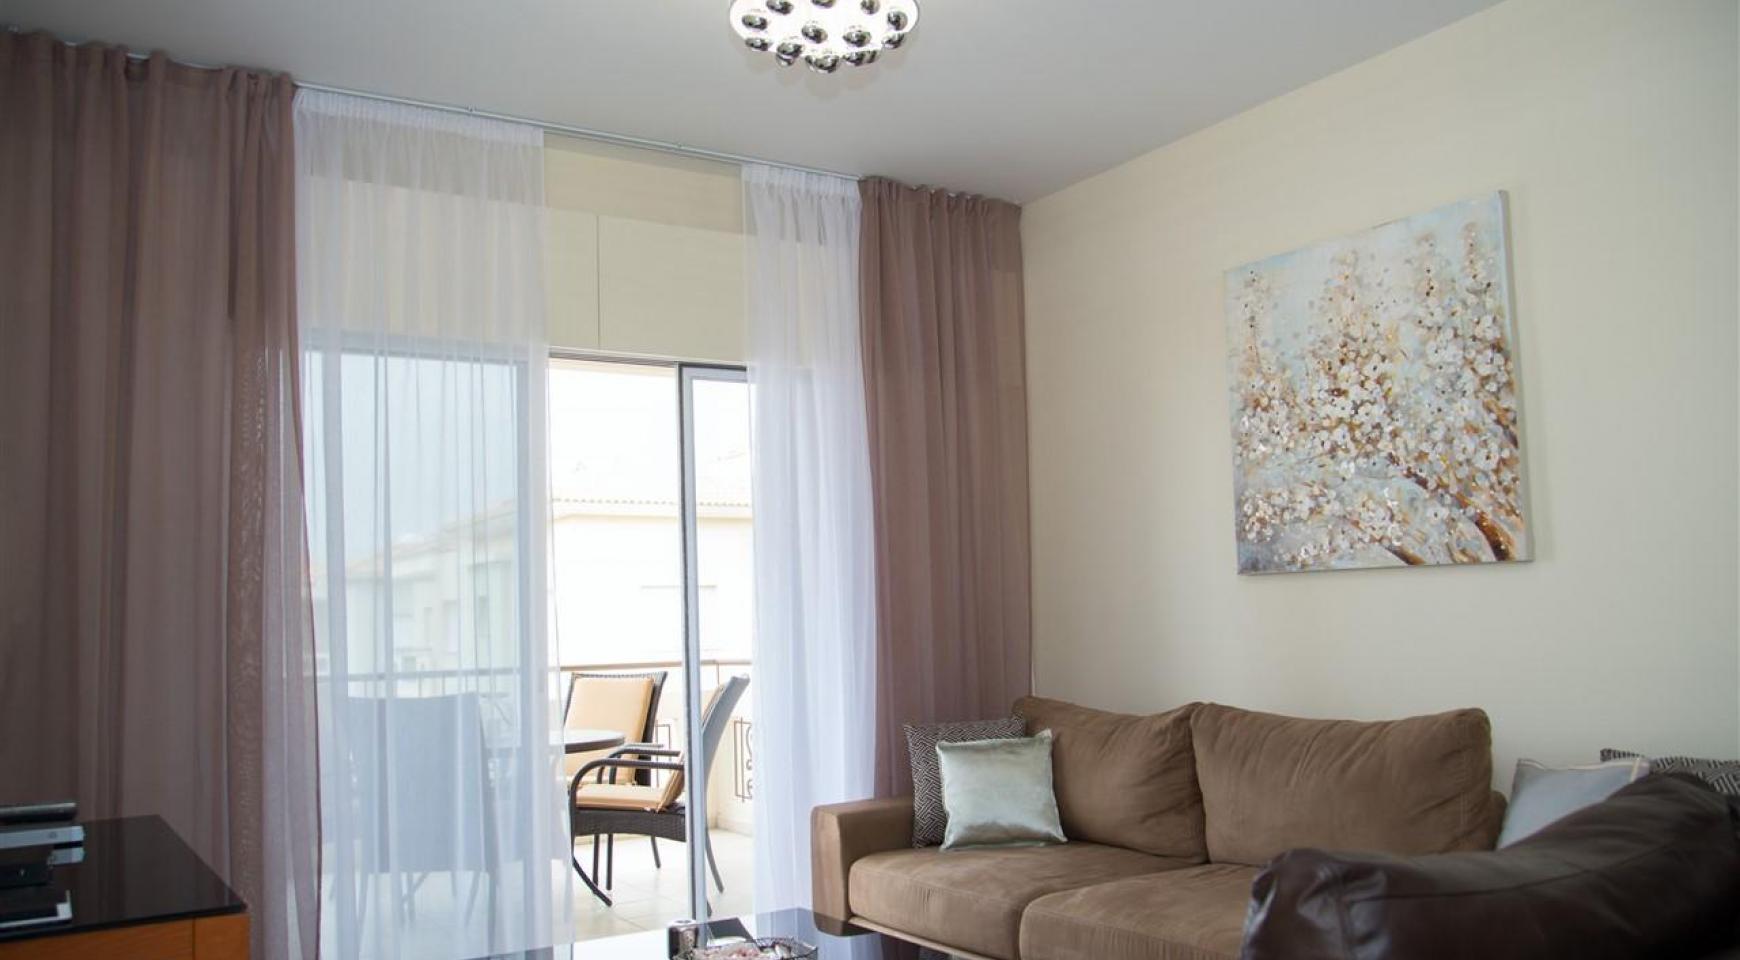 Luxury 2 Bedroom Apartment Mesogios Iris 304 in the Tourist area near the Beach - 6